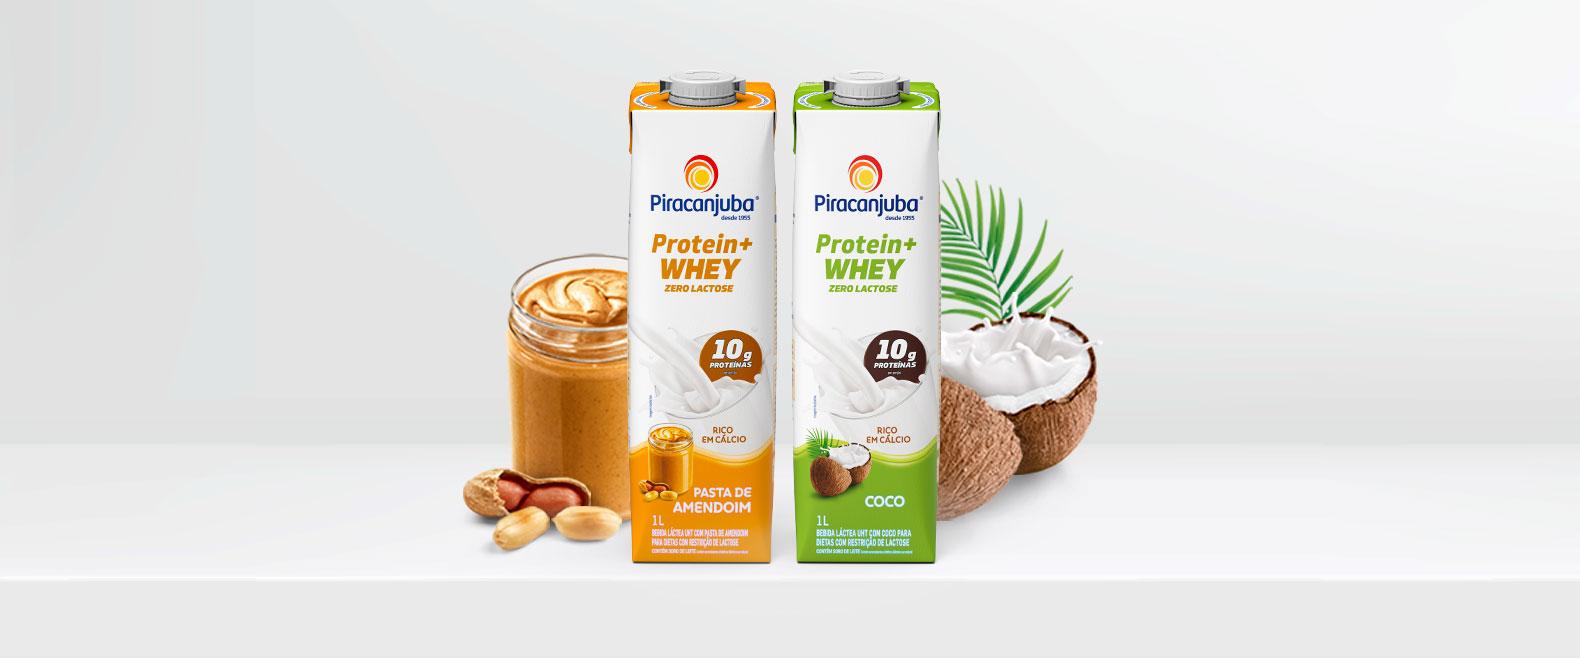 Conheça o Piracanjuba Protein + Whey